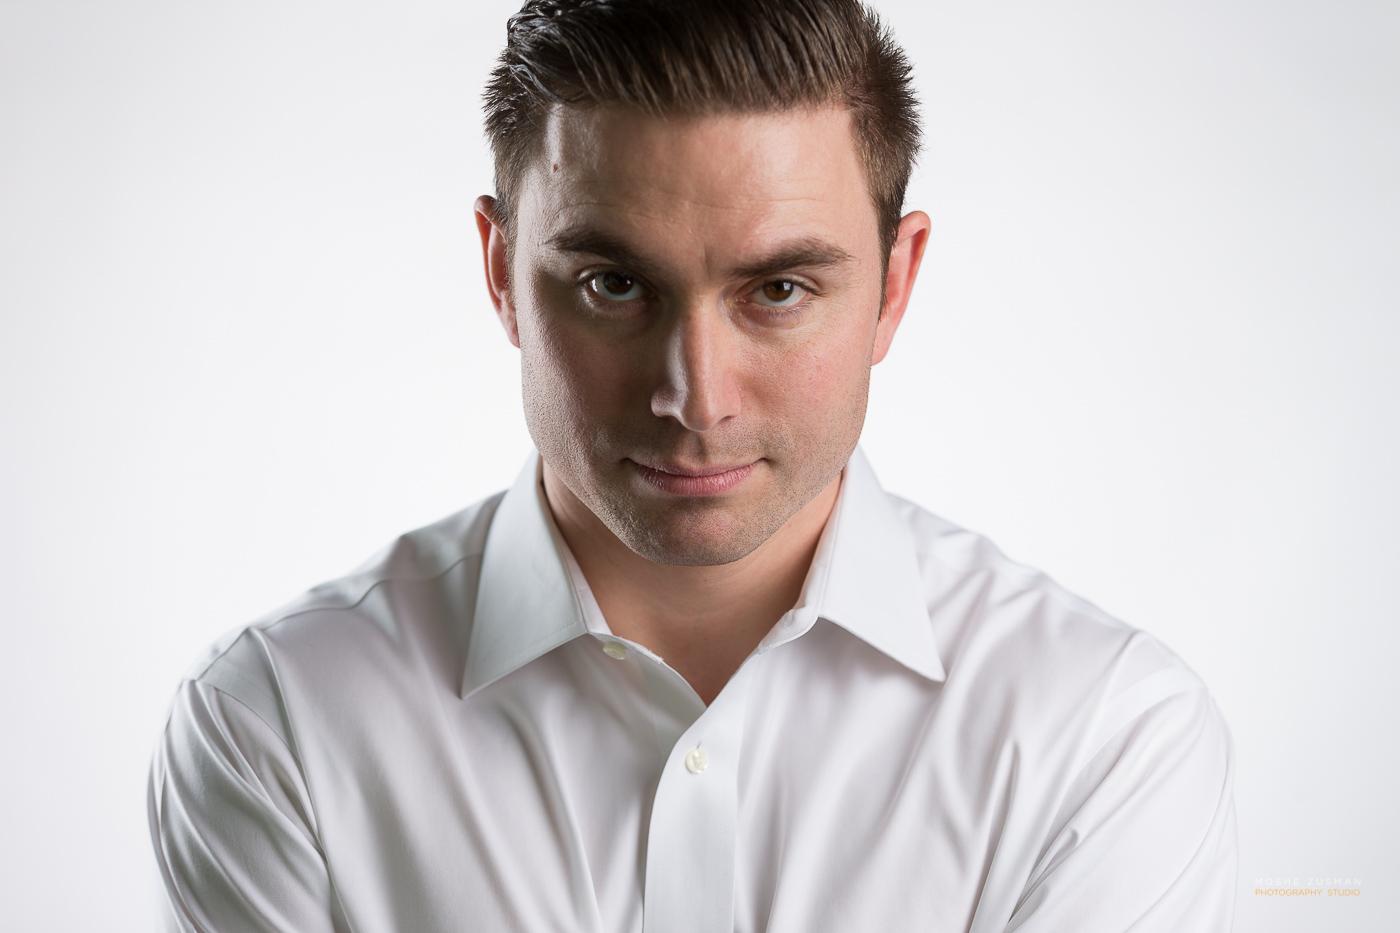 business-headshot-dc-photographer-04.jpg